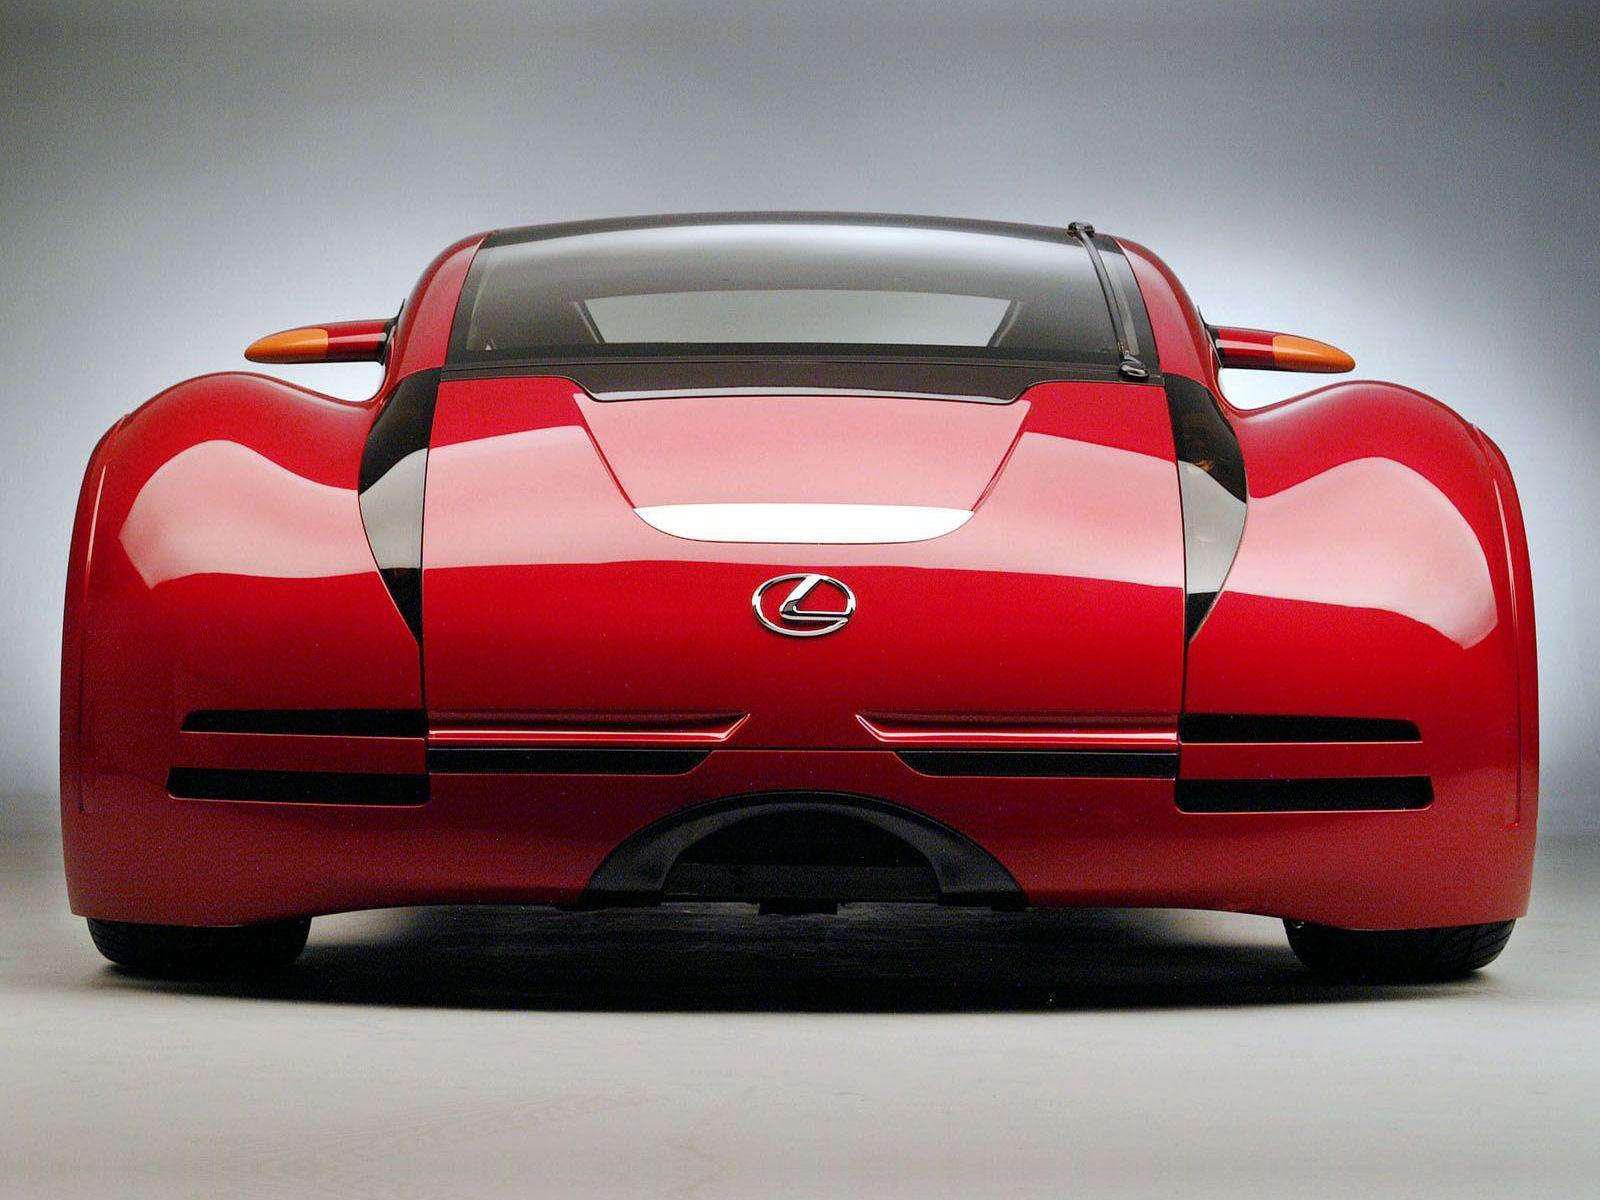 2054 minority report sports car concept japanese car photos. Black Bedroom Furniture Sets. Home Design Ideas